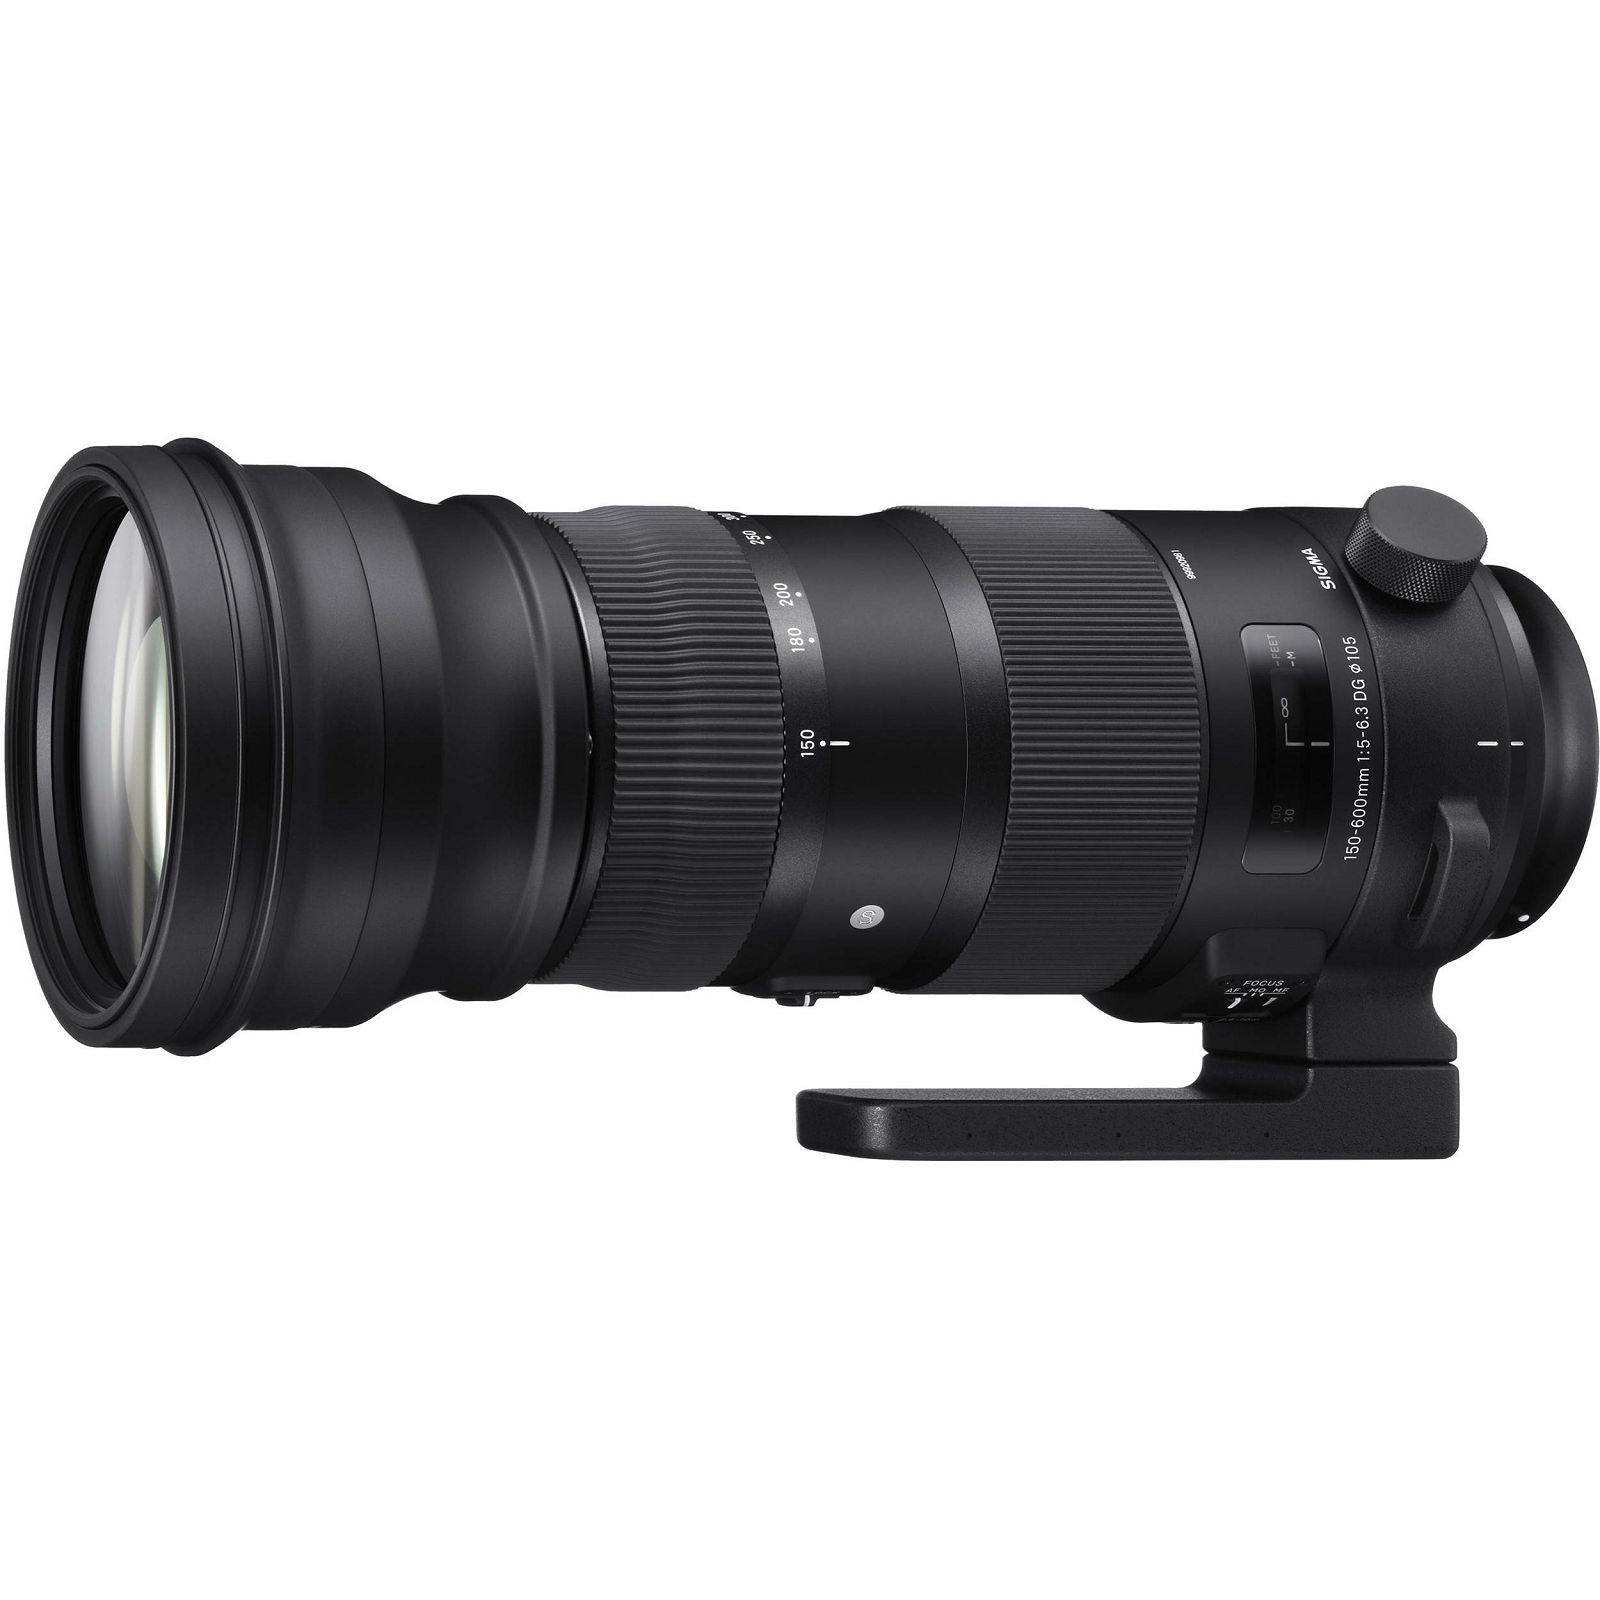 Sigma 150-600mm f/5-6.3 DG OS HSM Sport telefoto objektiv za Sigma SA zoom lens 150-600 F5-6.3 150-600/5,0-6,3 (740956)